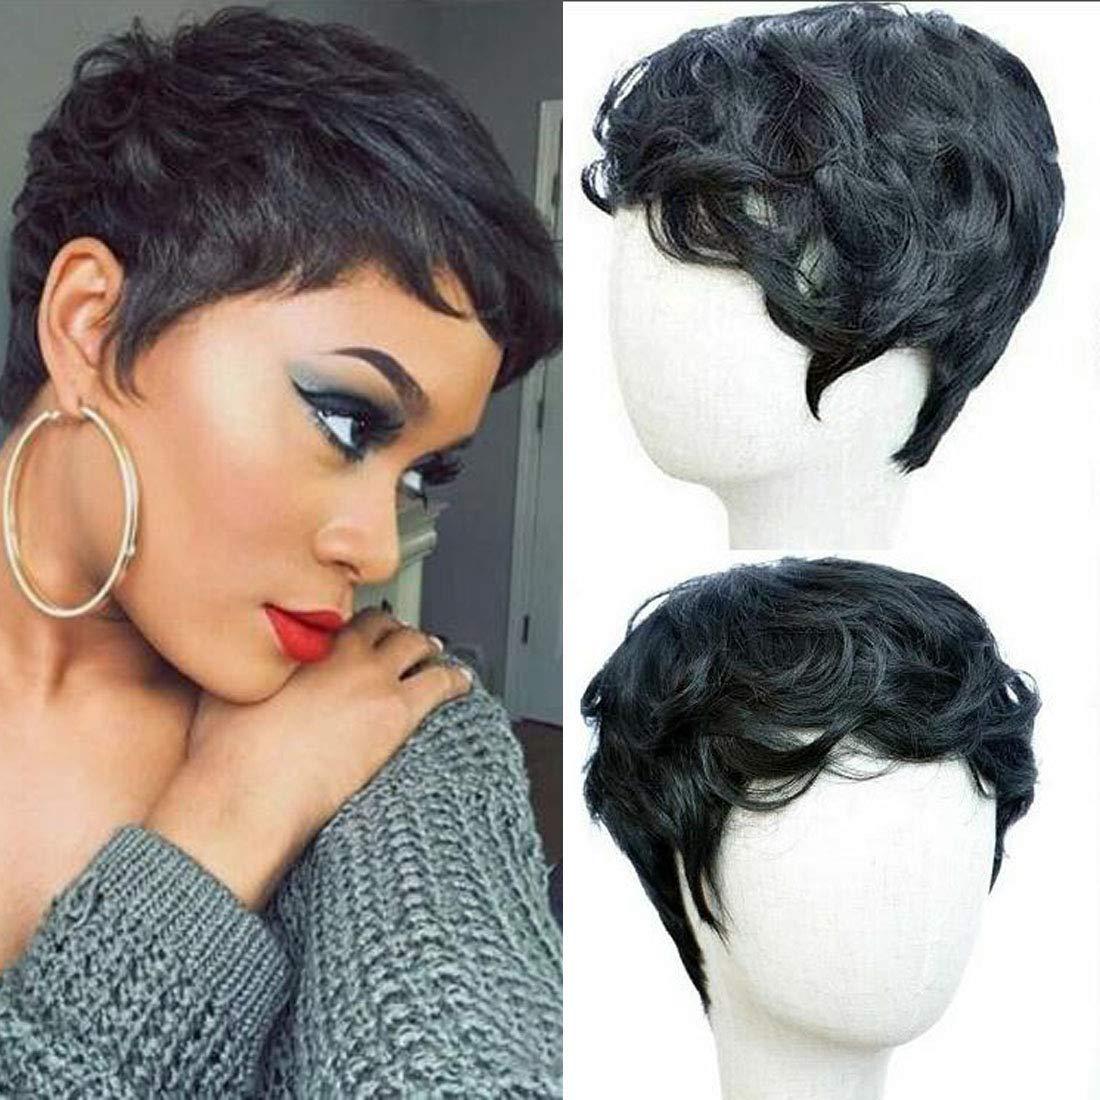 Amazon Com Flandi Short Natural Synthetic Hair Wigs Synthetic Short Black Pixie Cut Wig Heat Resistant Fiber Hair For Black Women Beauty